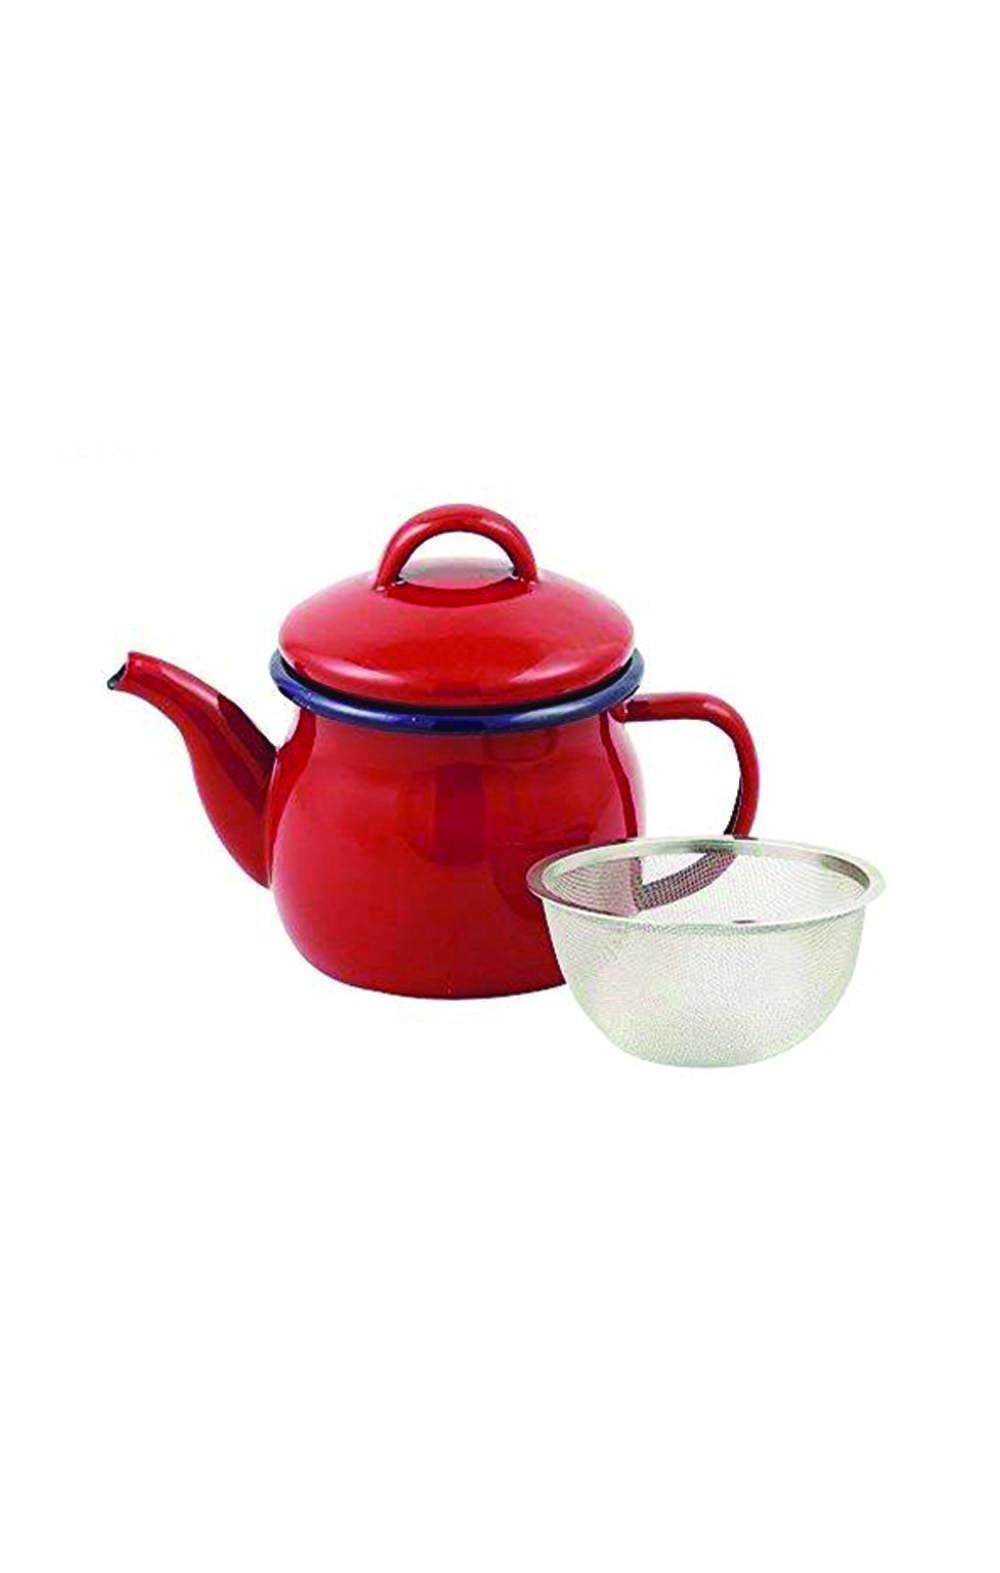 Pearl Metal Teapot Red 580ml ابريق شاي